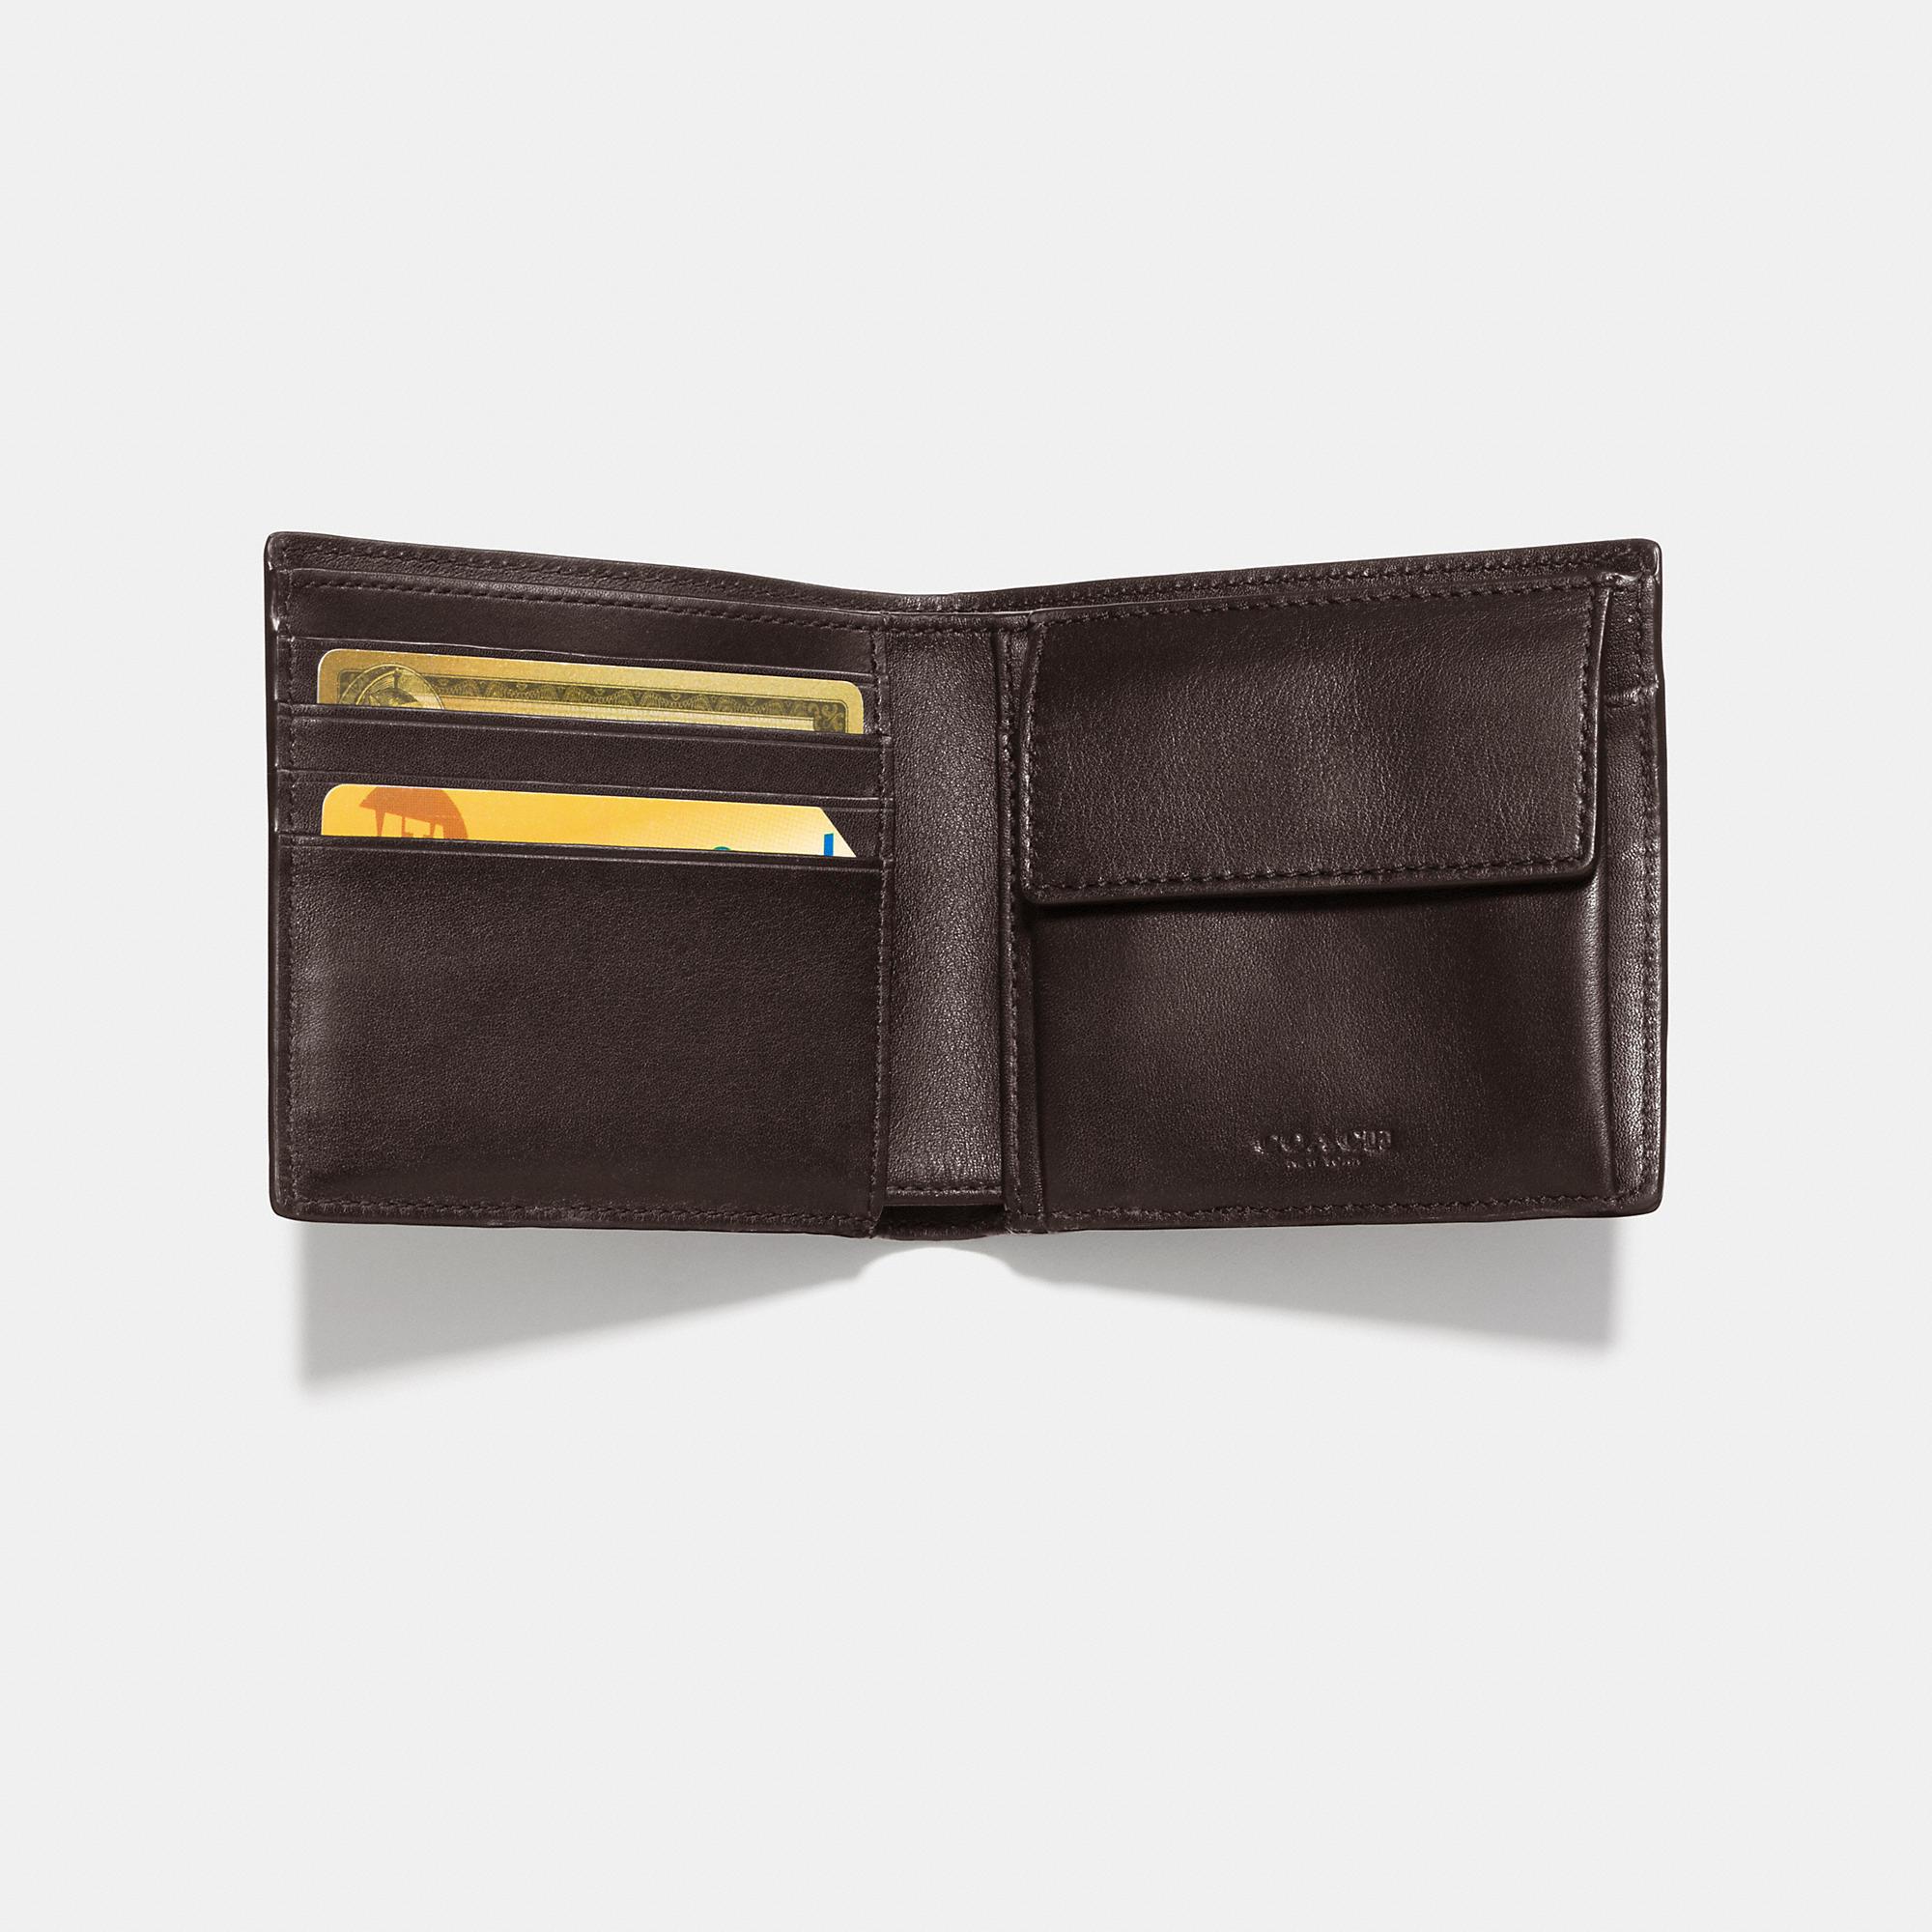 e042d185 uk coach coin wallet 22703 a6f42